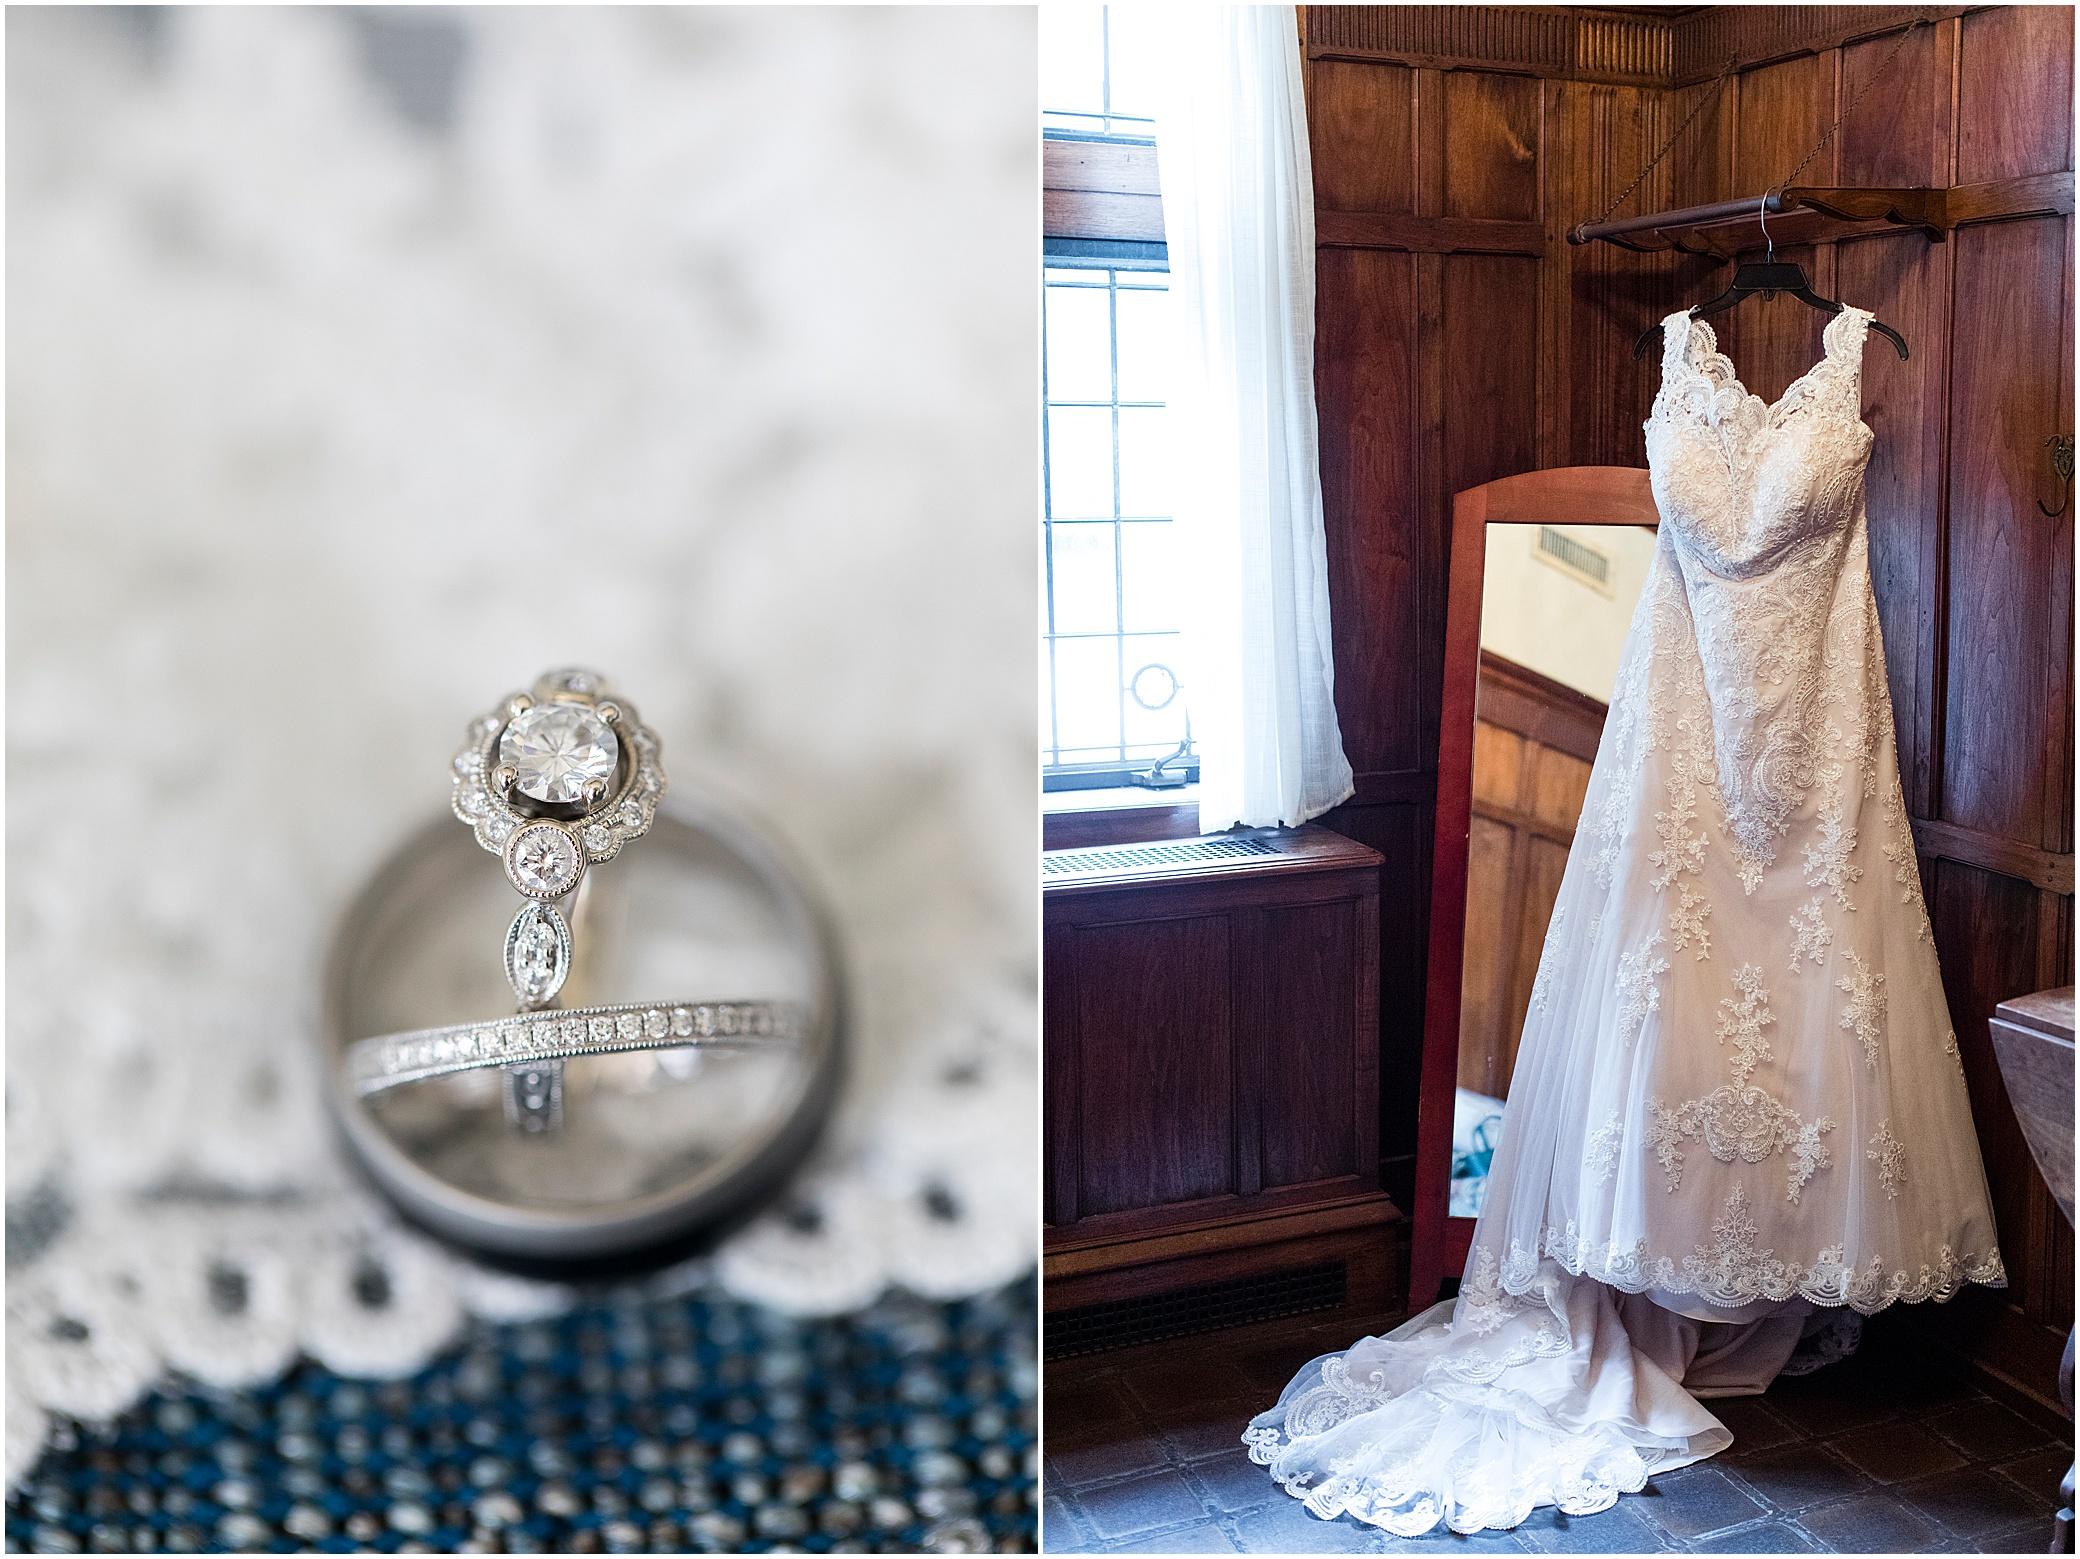 hermitage museum and gardens elopement wedding details wedding rings studio i do wedding dress